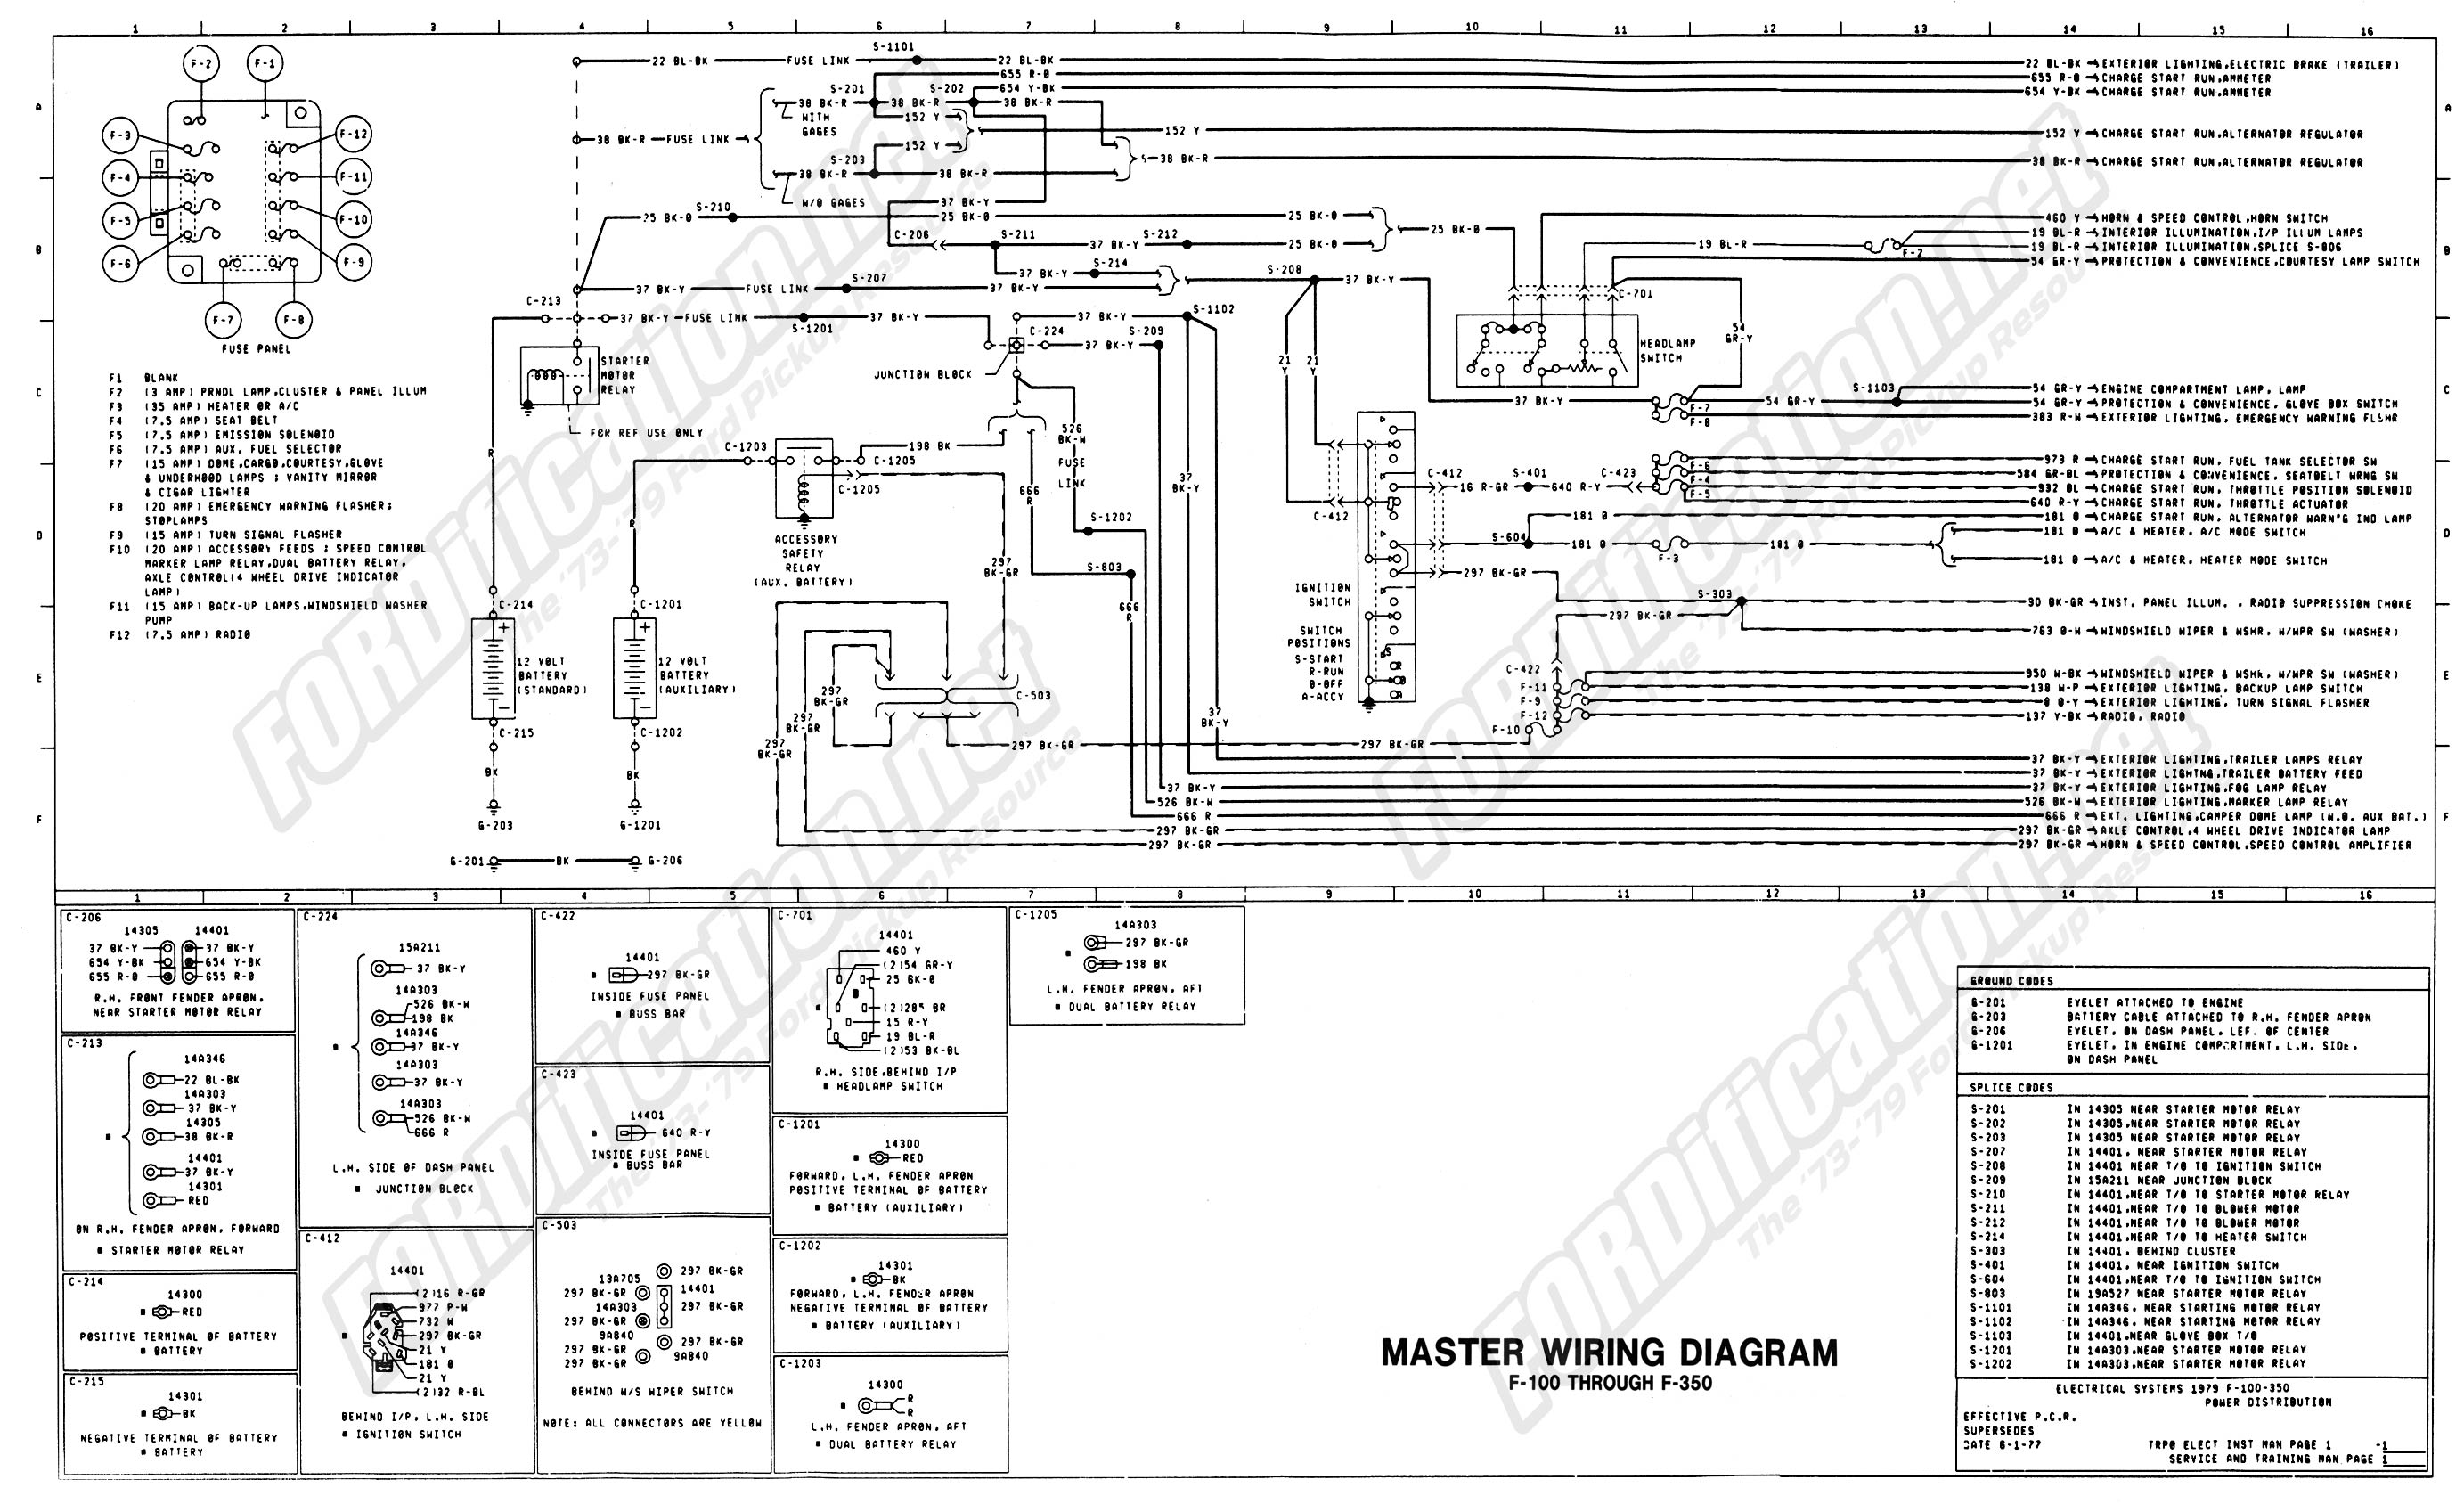 Ford Lt40 Starter Wiring   Data Wiring BBlank rich explicit ...